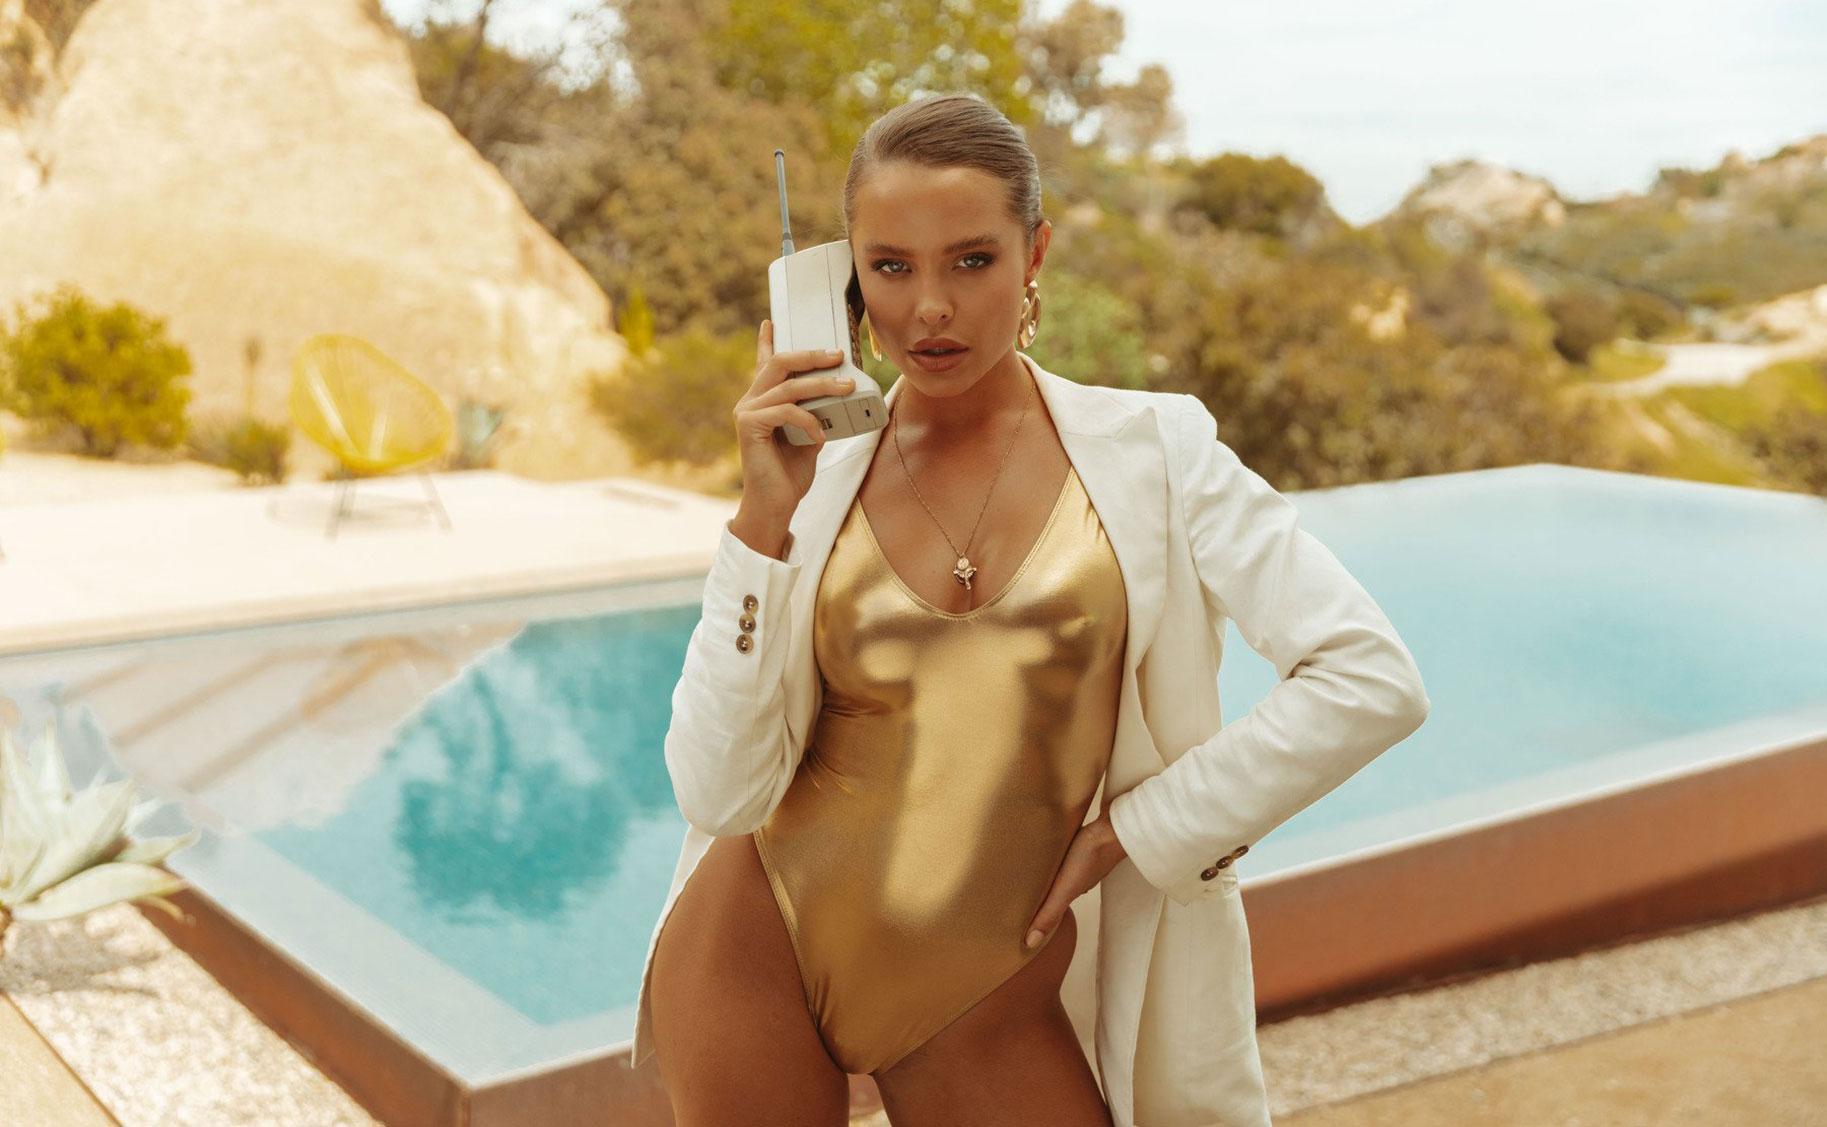 Мара Тиген в нижнем белье и купальниках модного бренда Gooseberry Intimates / фото 31